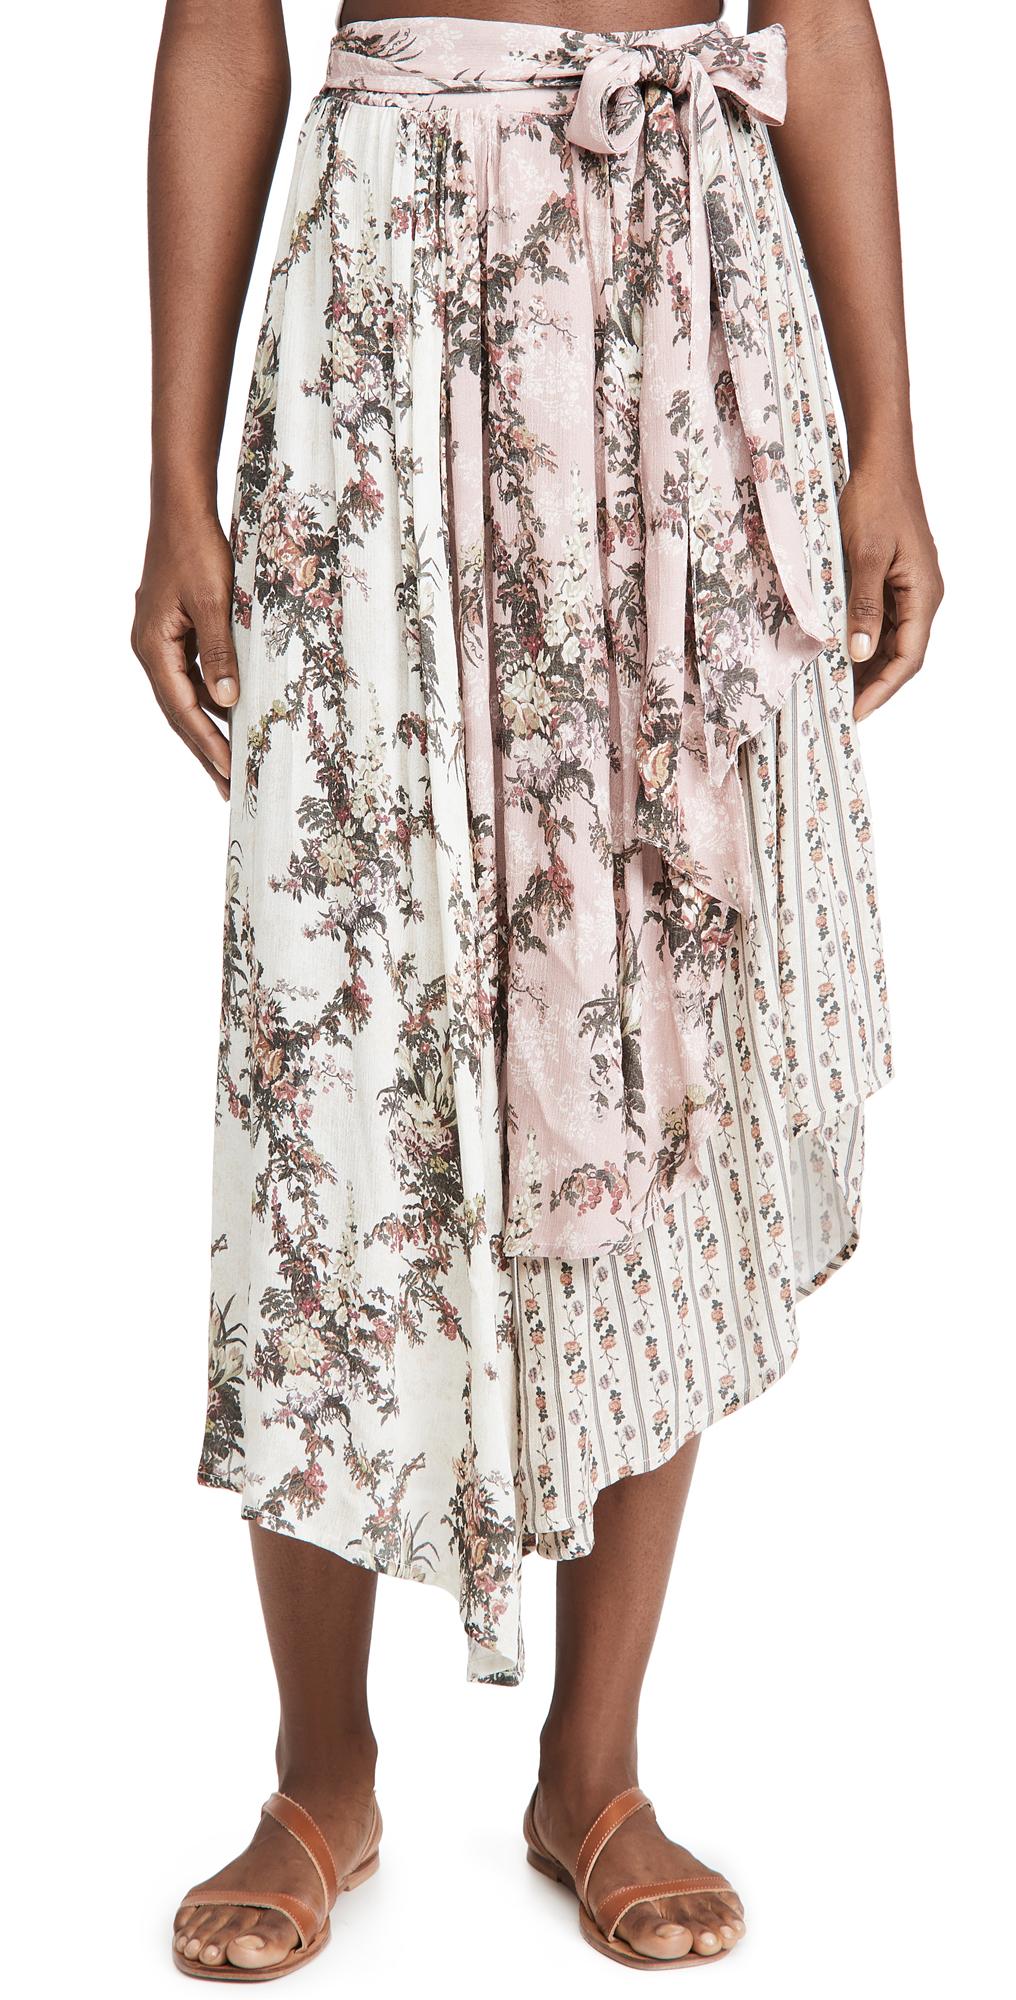 Agua Bendita Kaylee Papier Skirt